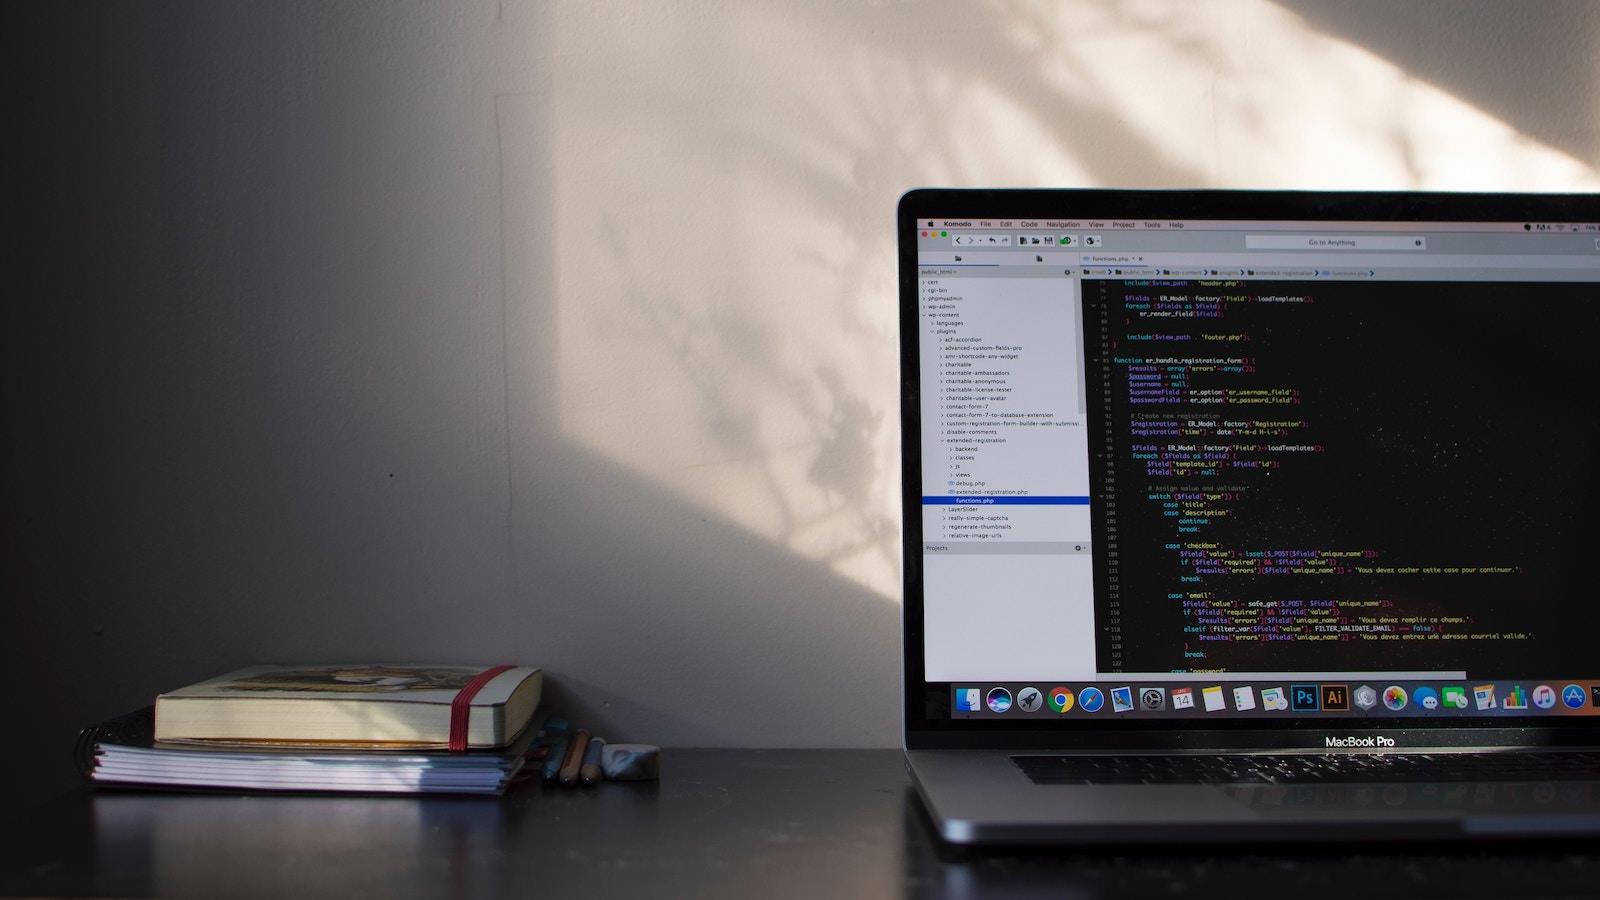 emile-perron-xrVDYZRGdw4-unsplash-macbook-pro-coding.jpg